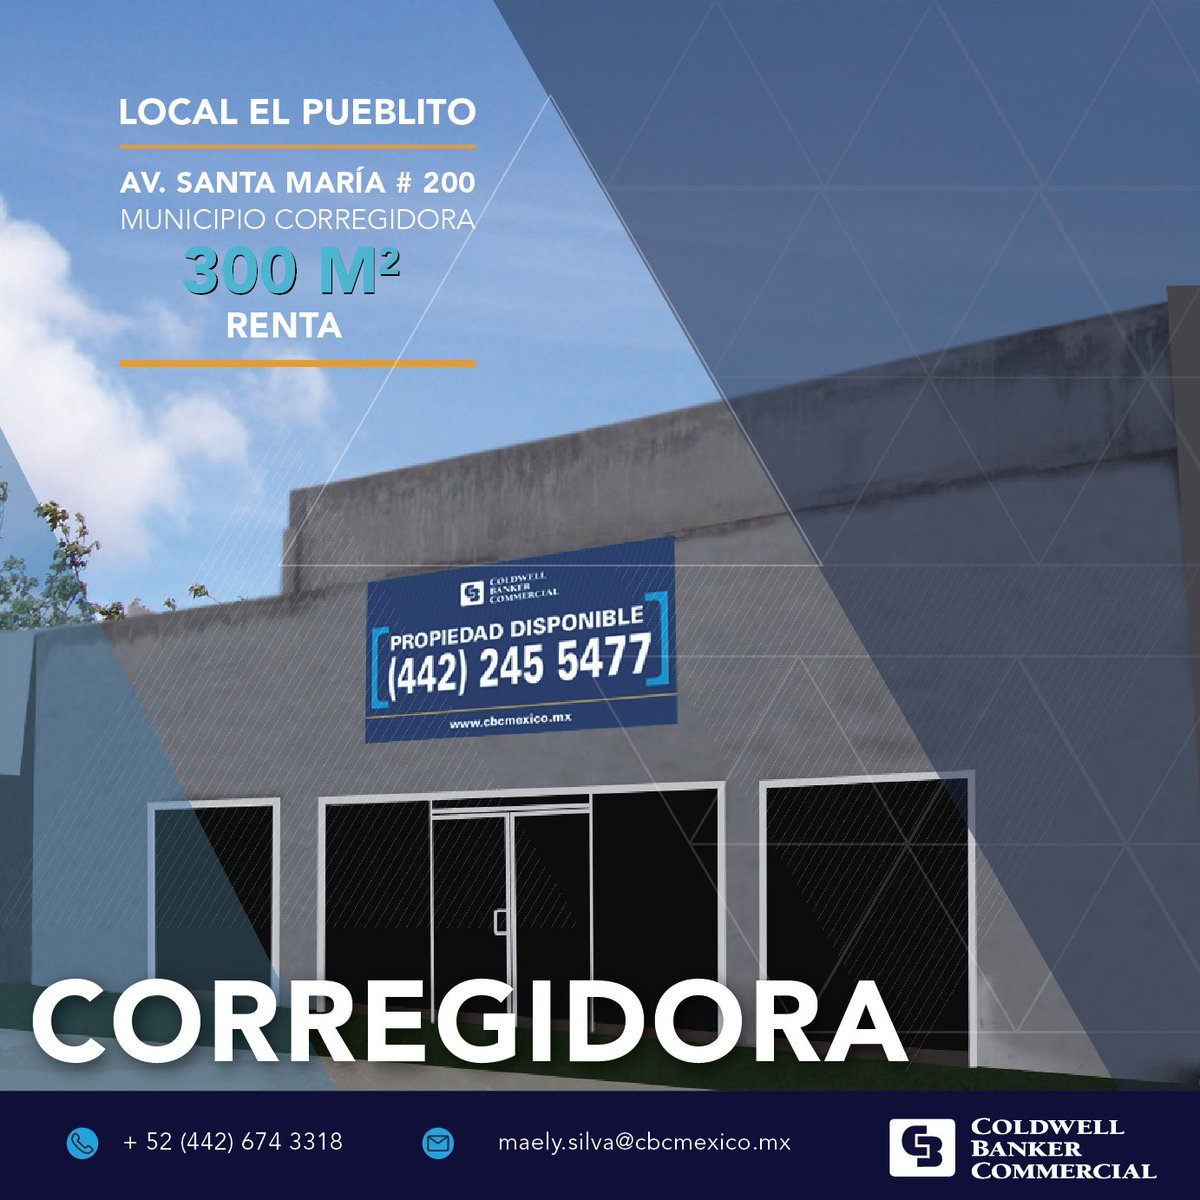 Coldwell Banker On Twitter Local Comercial En El Pueblito